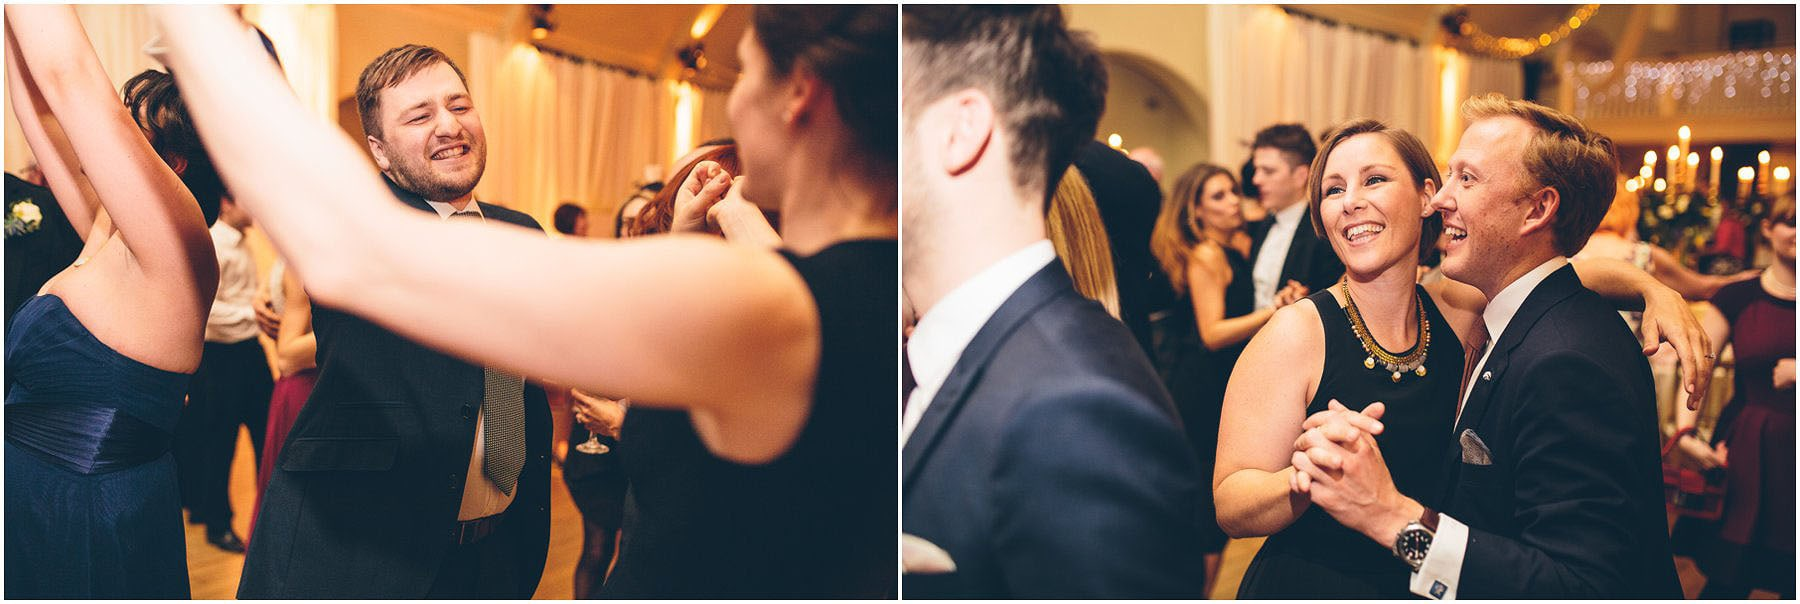 Bowdon_Rooms_Wedding_Photography_0118